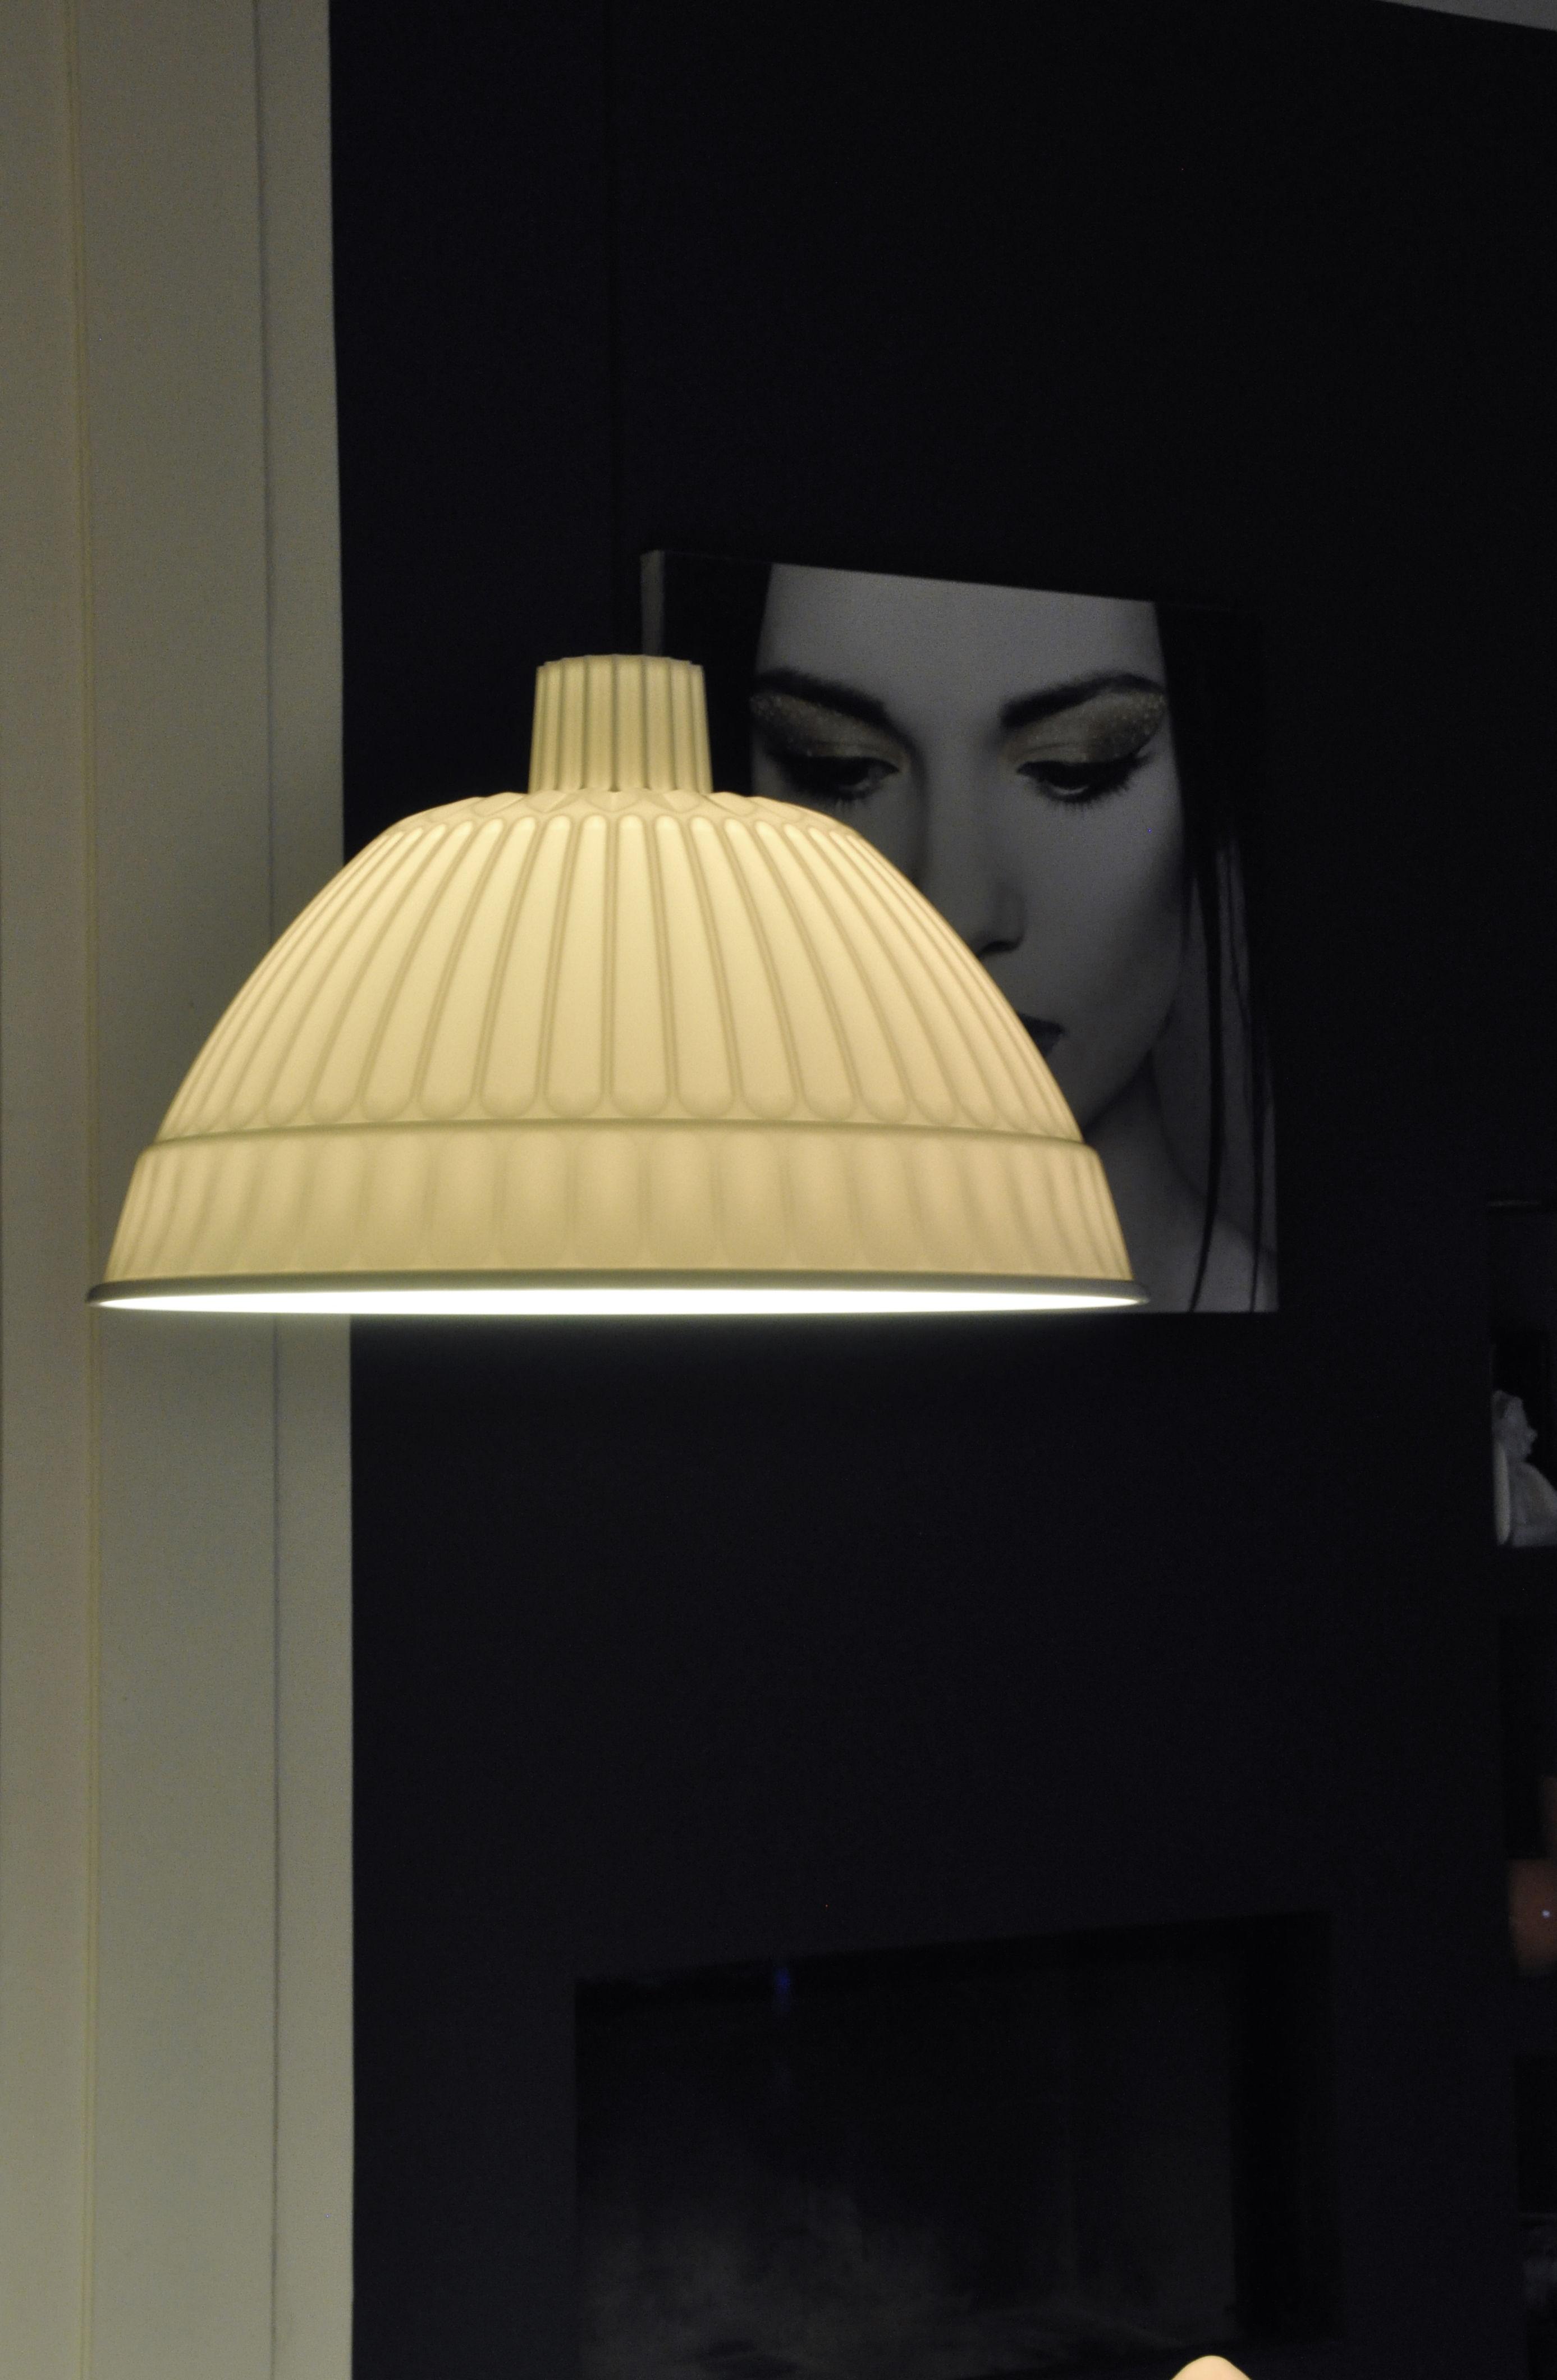 Home > Illuminazione > Lampadari > Sospensione Cloche di Fontana Arte